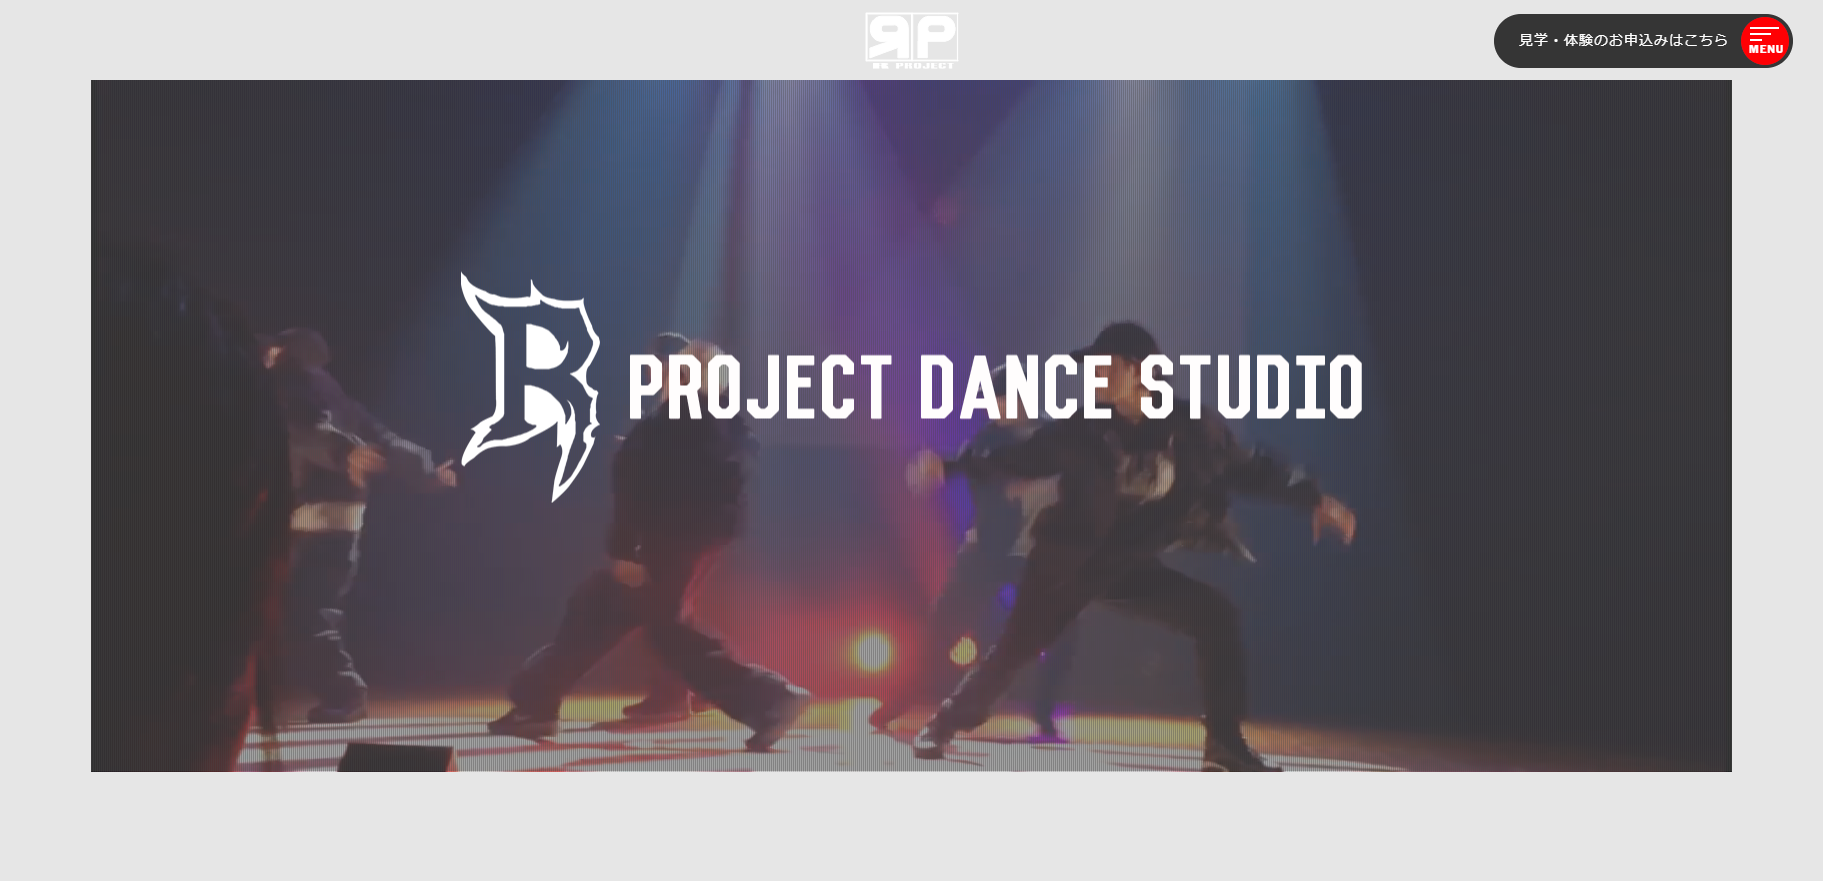 R-PROJECT DANCE STUDIO